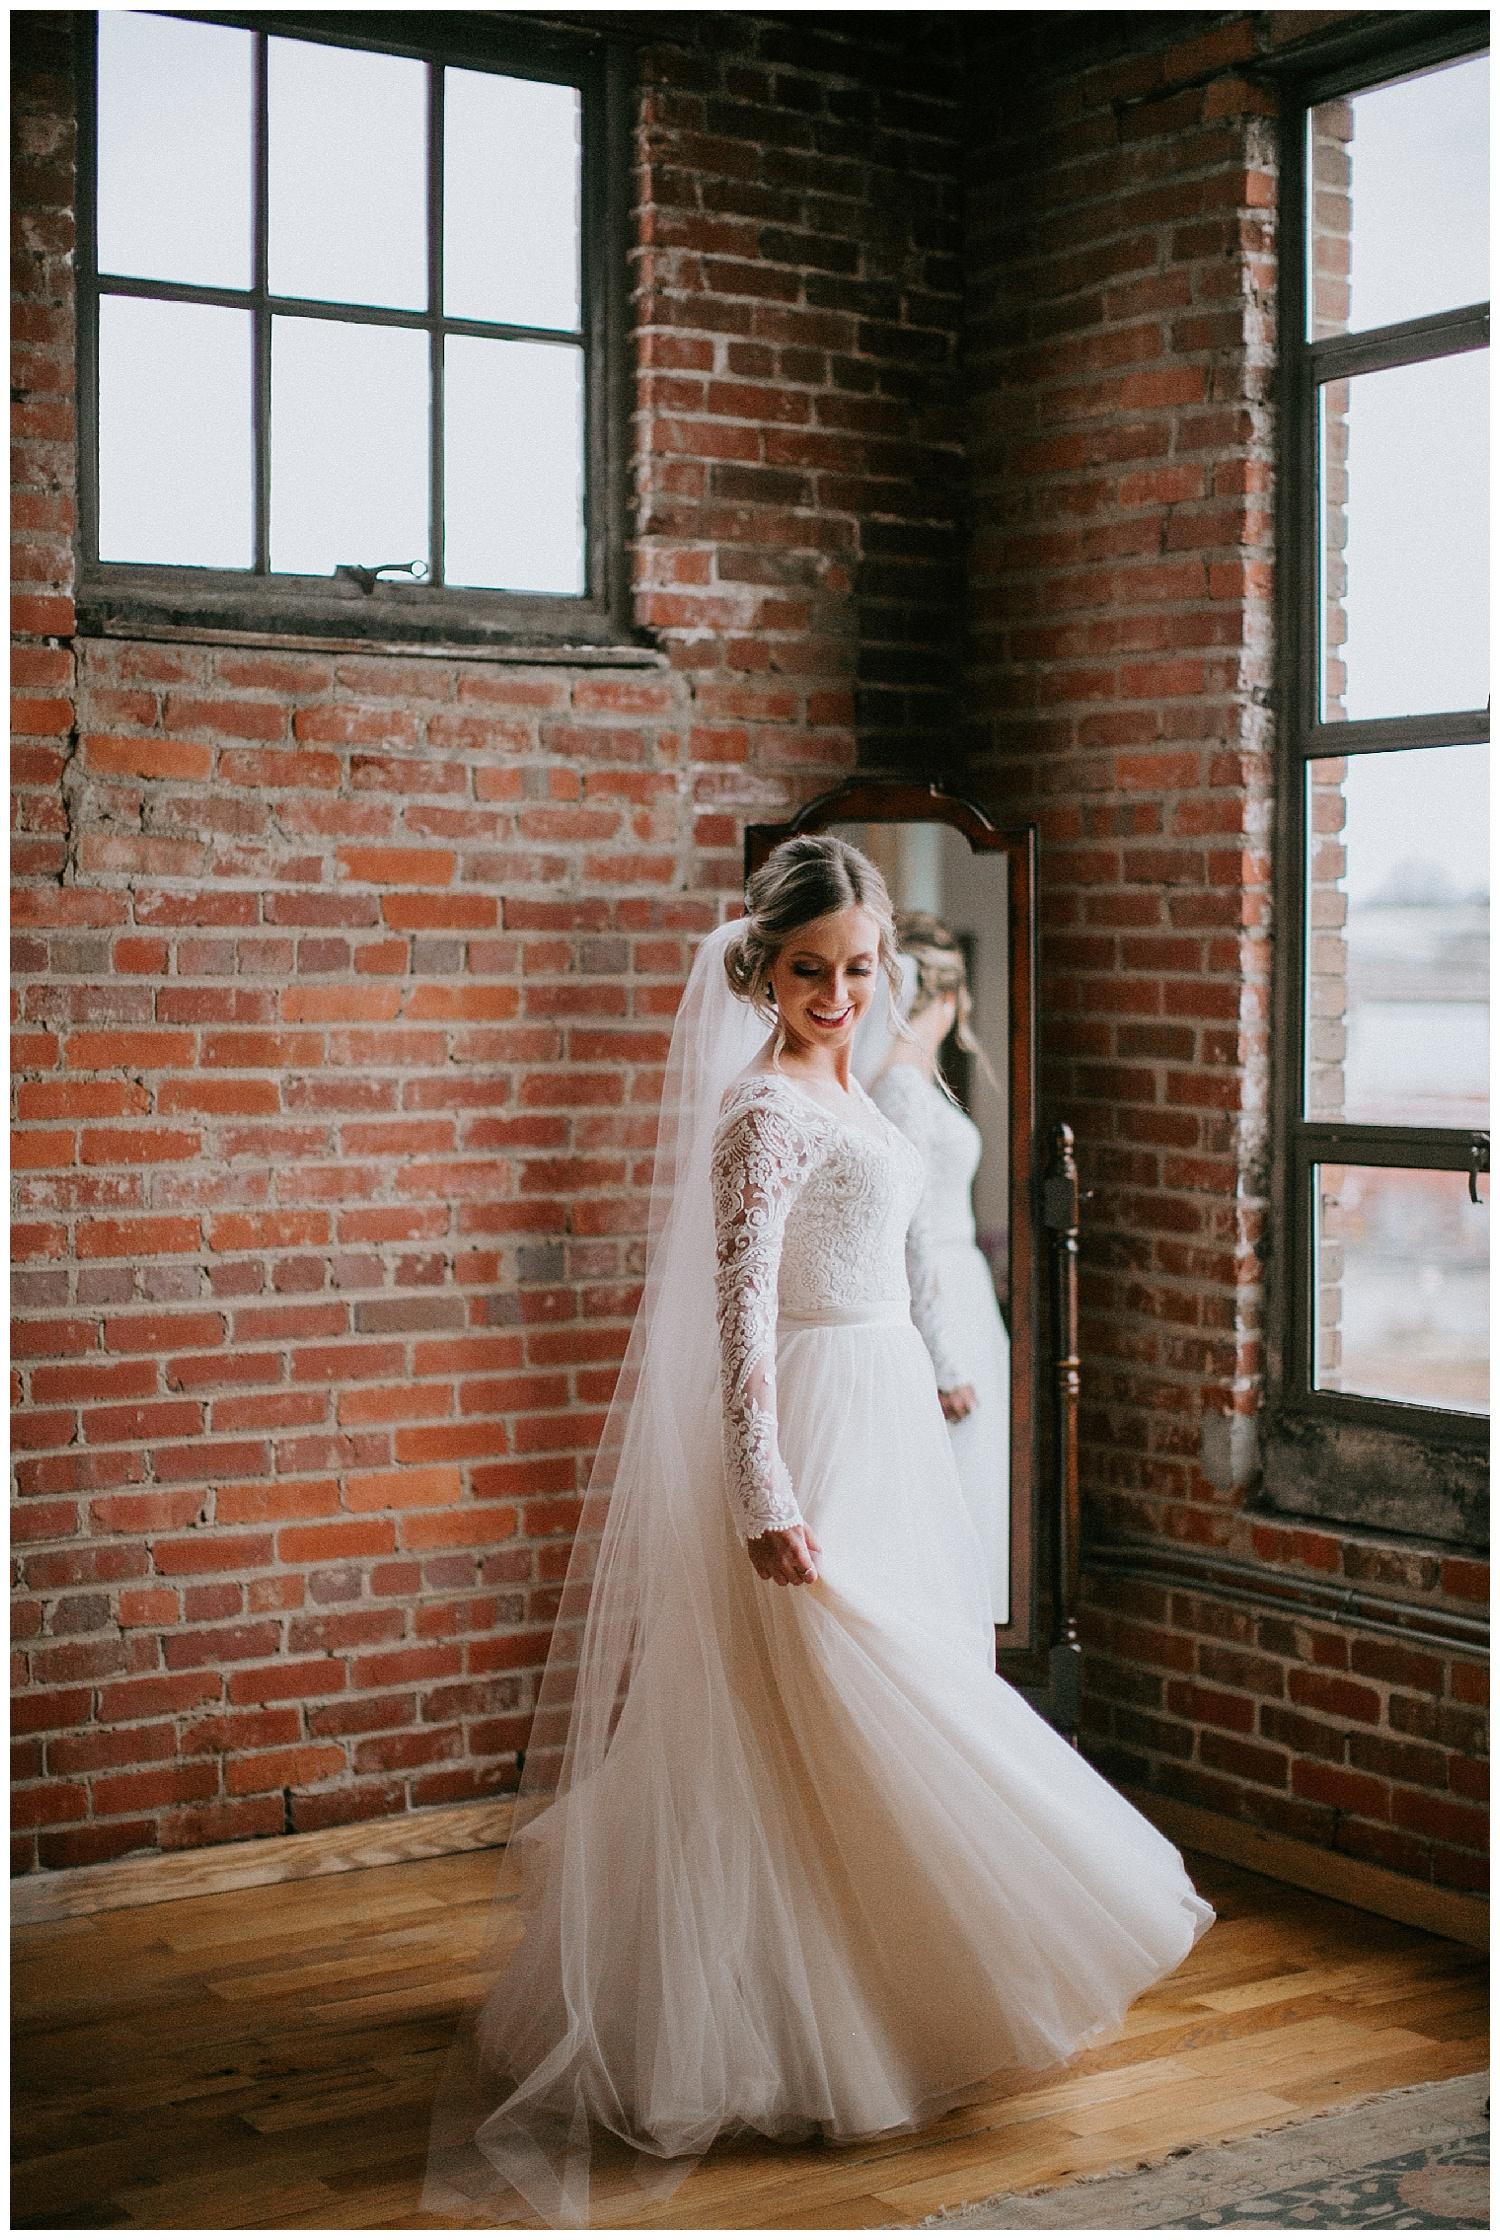 winter-wedding-the standard-knoxville_2019-01-23_0013.jpg